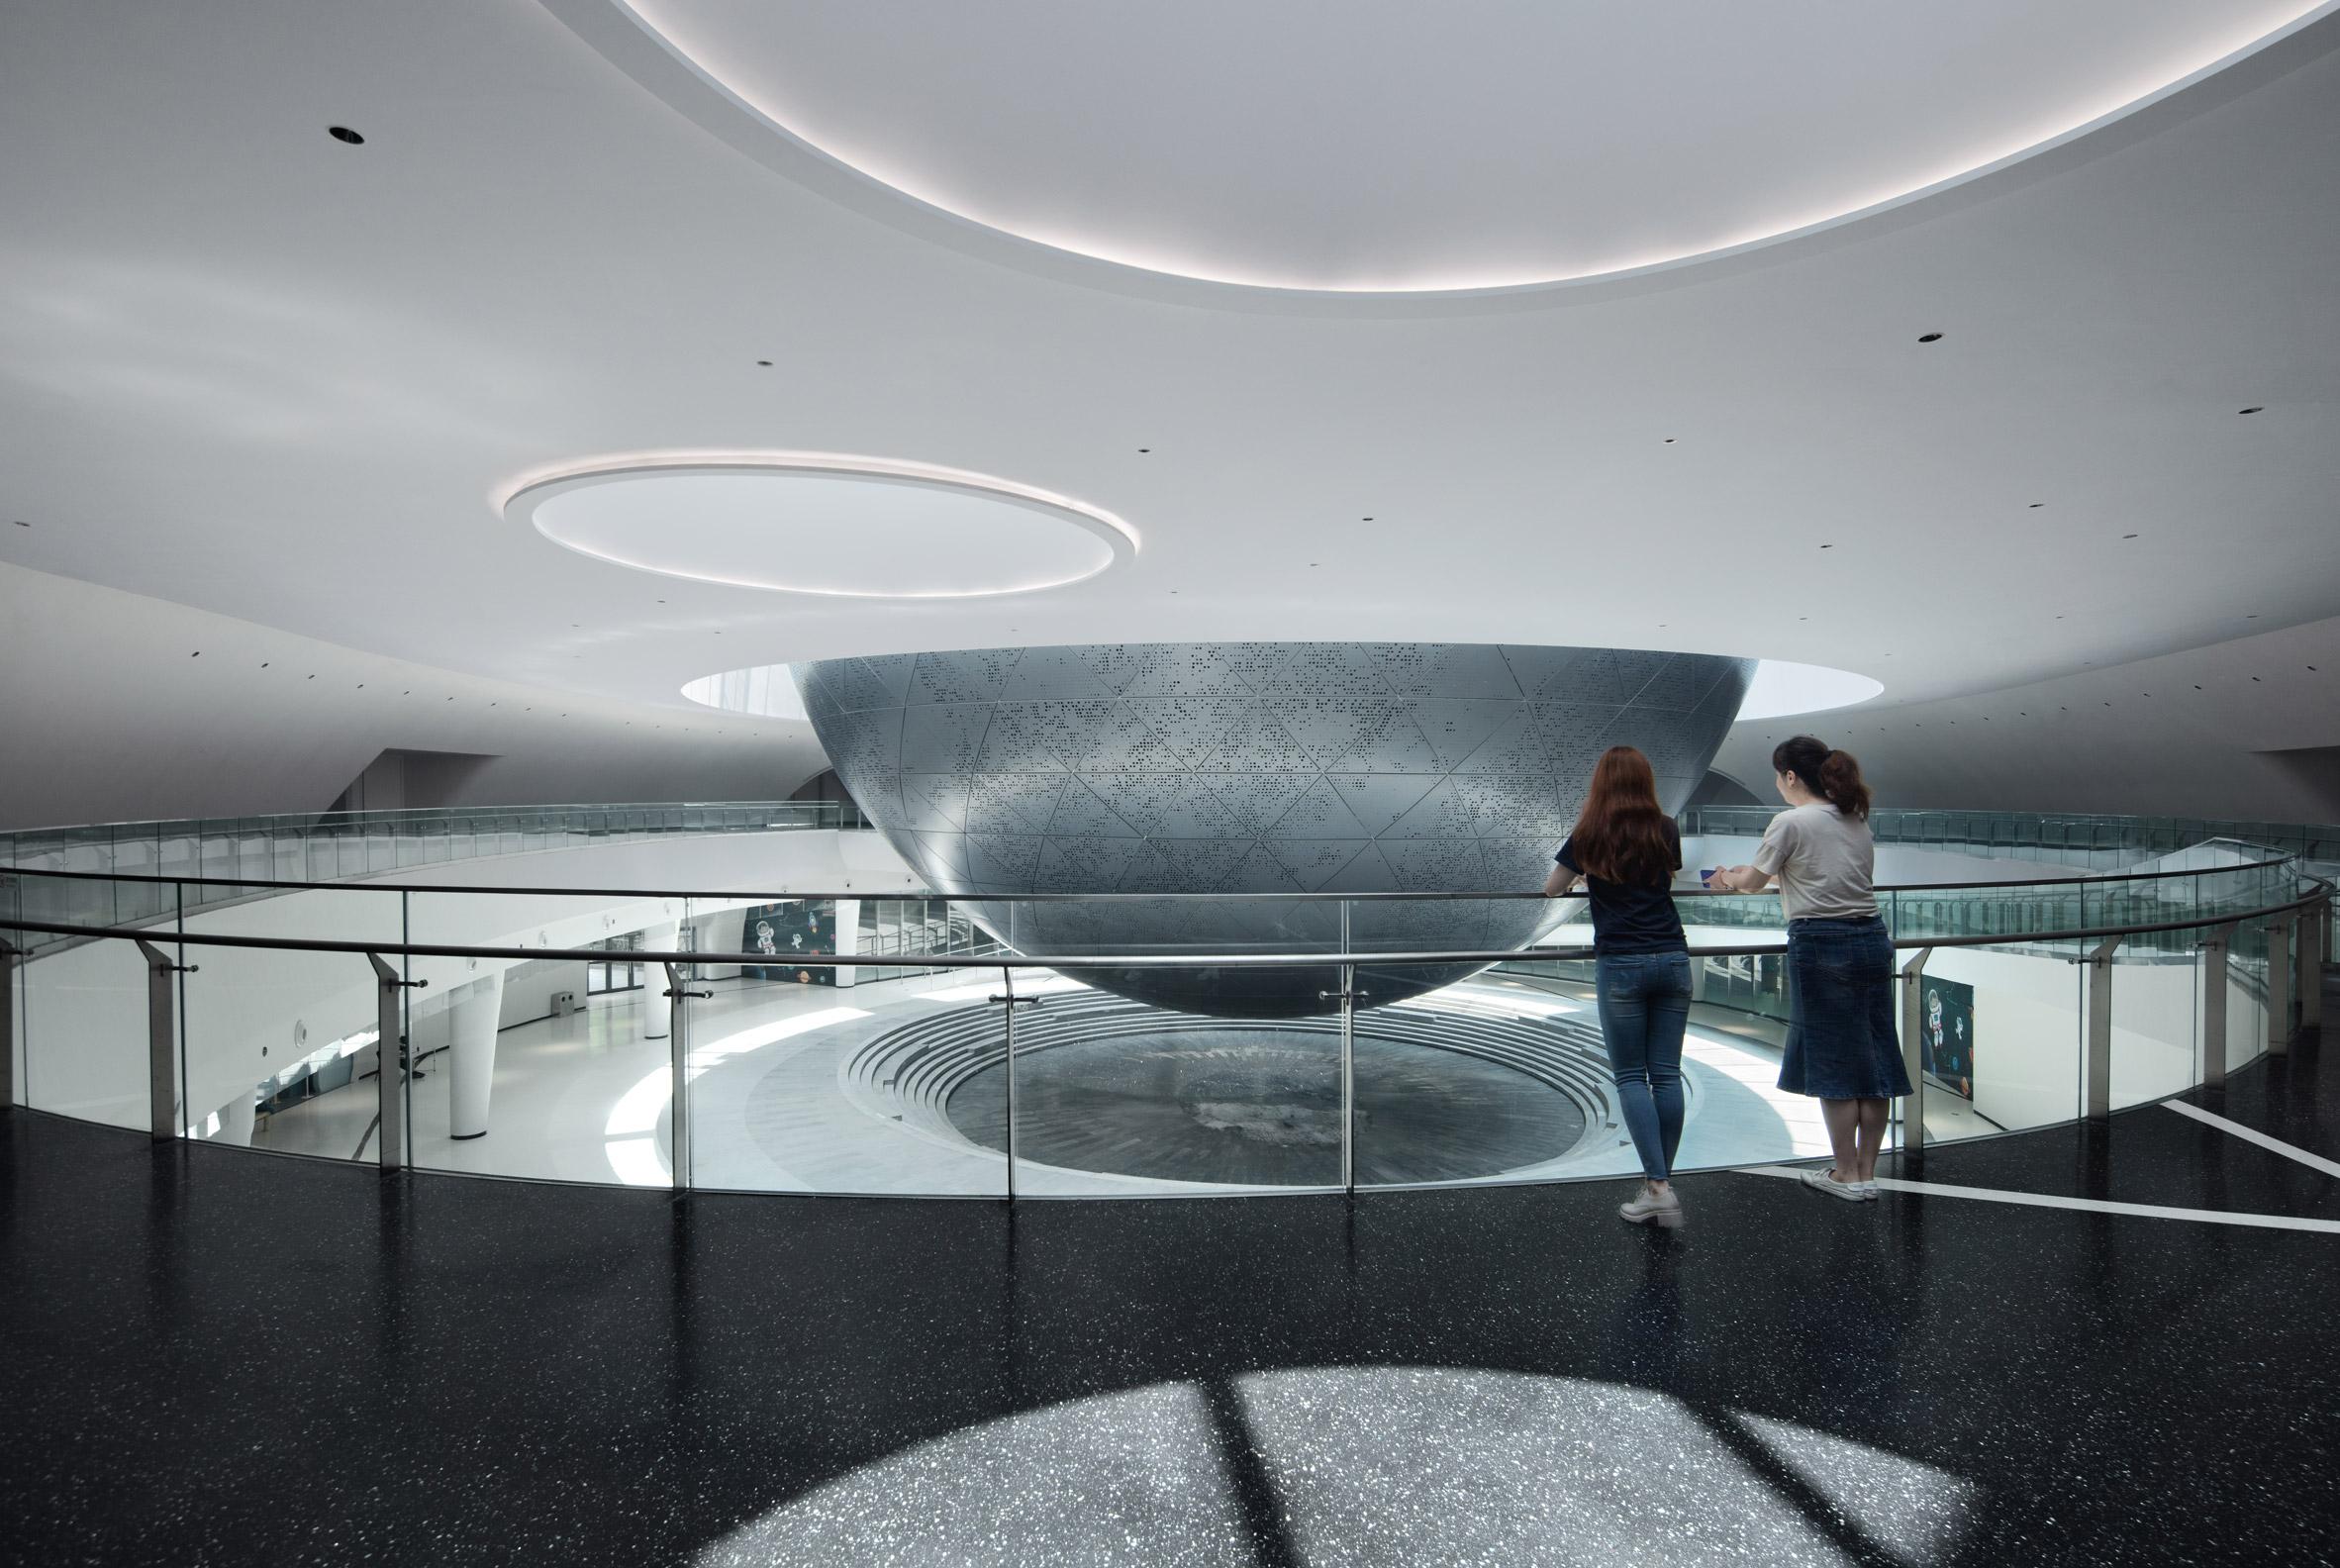 Sphere-shaped planetarium